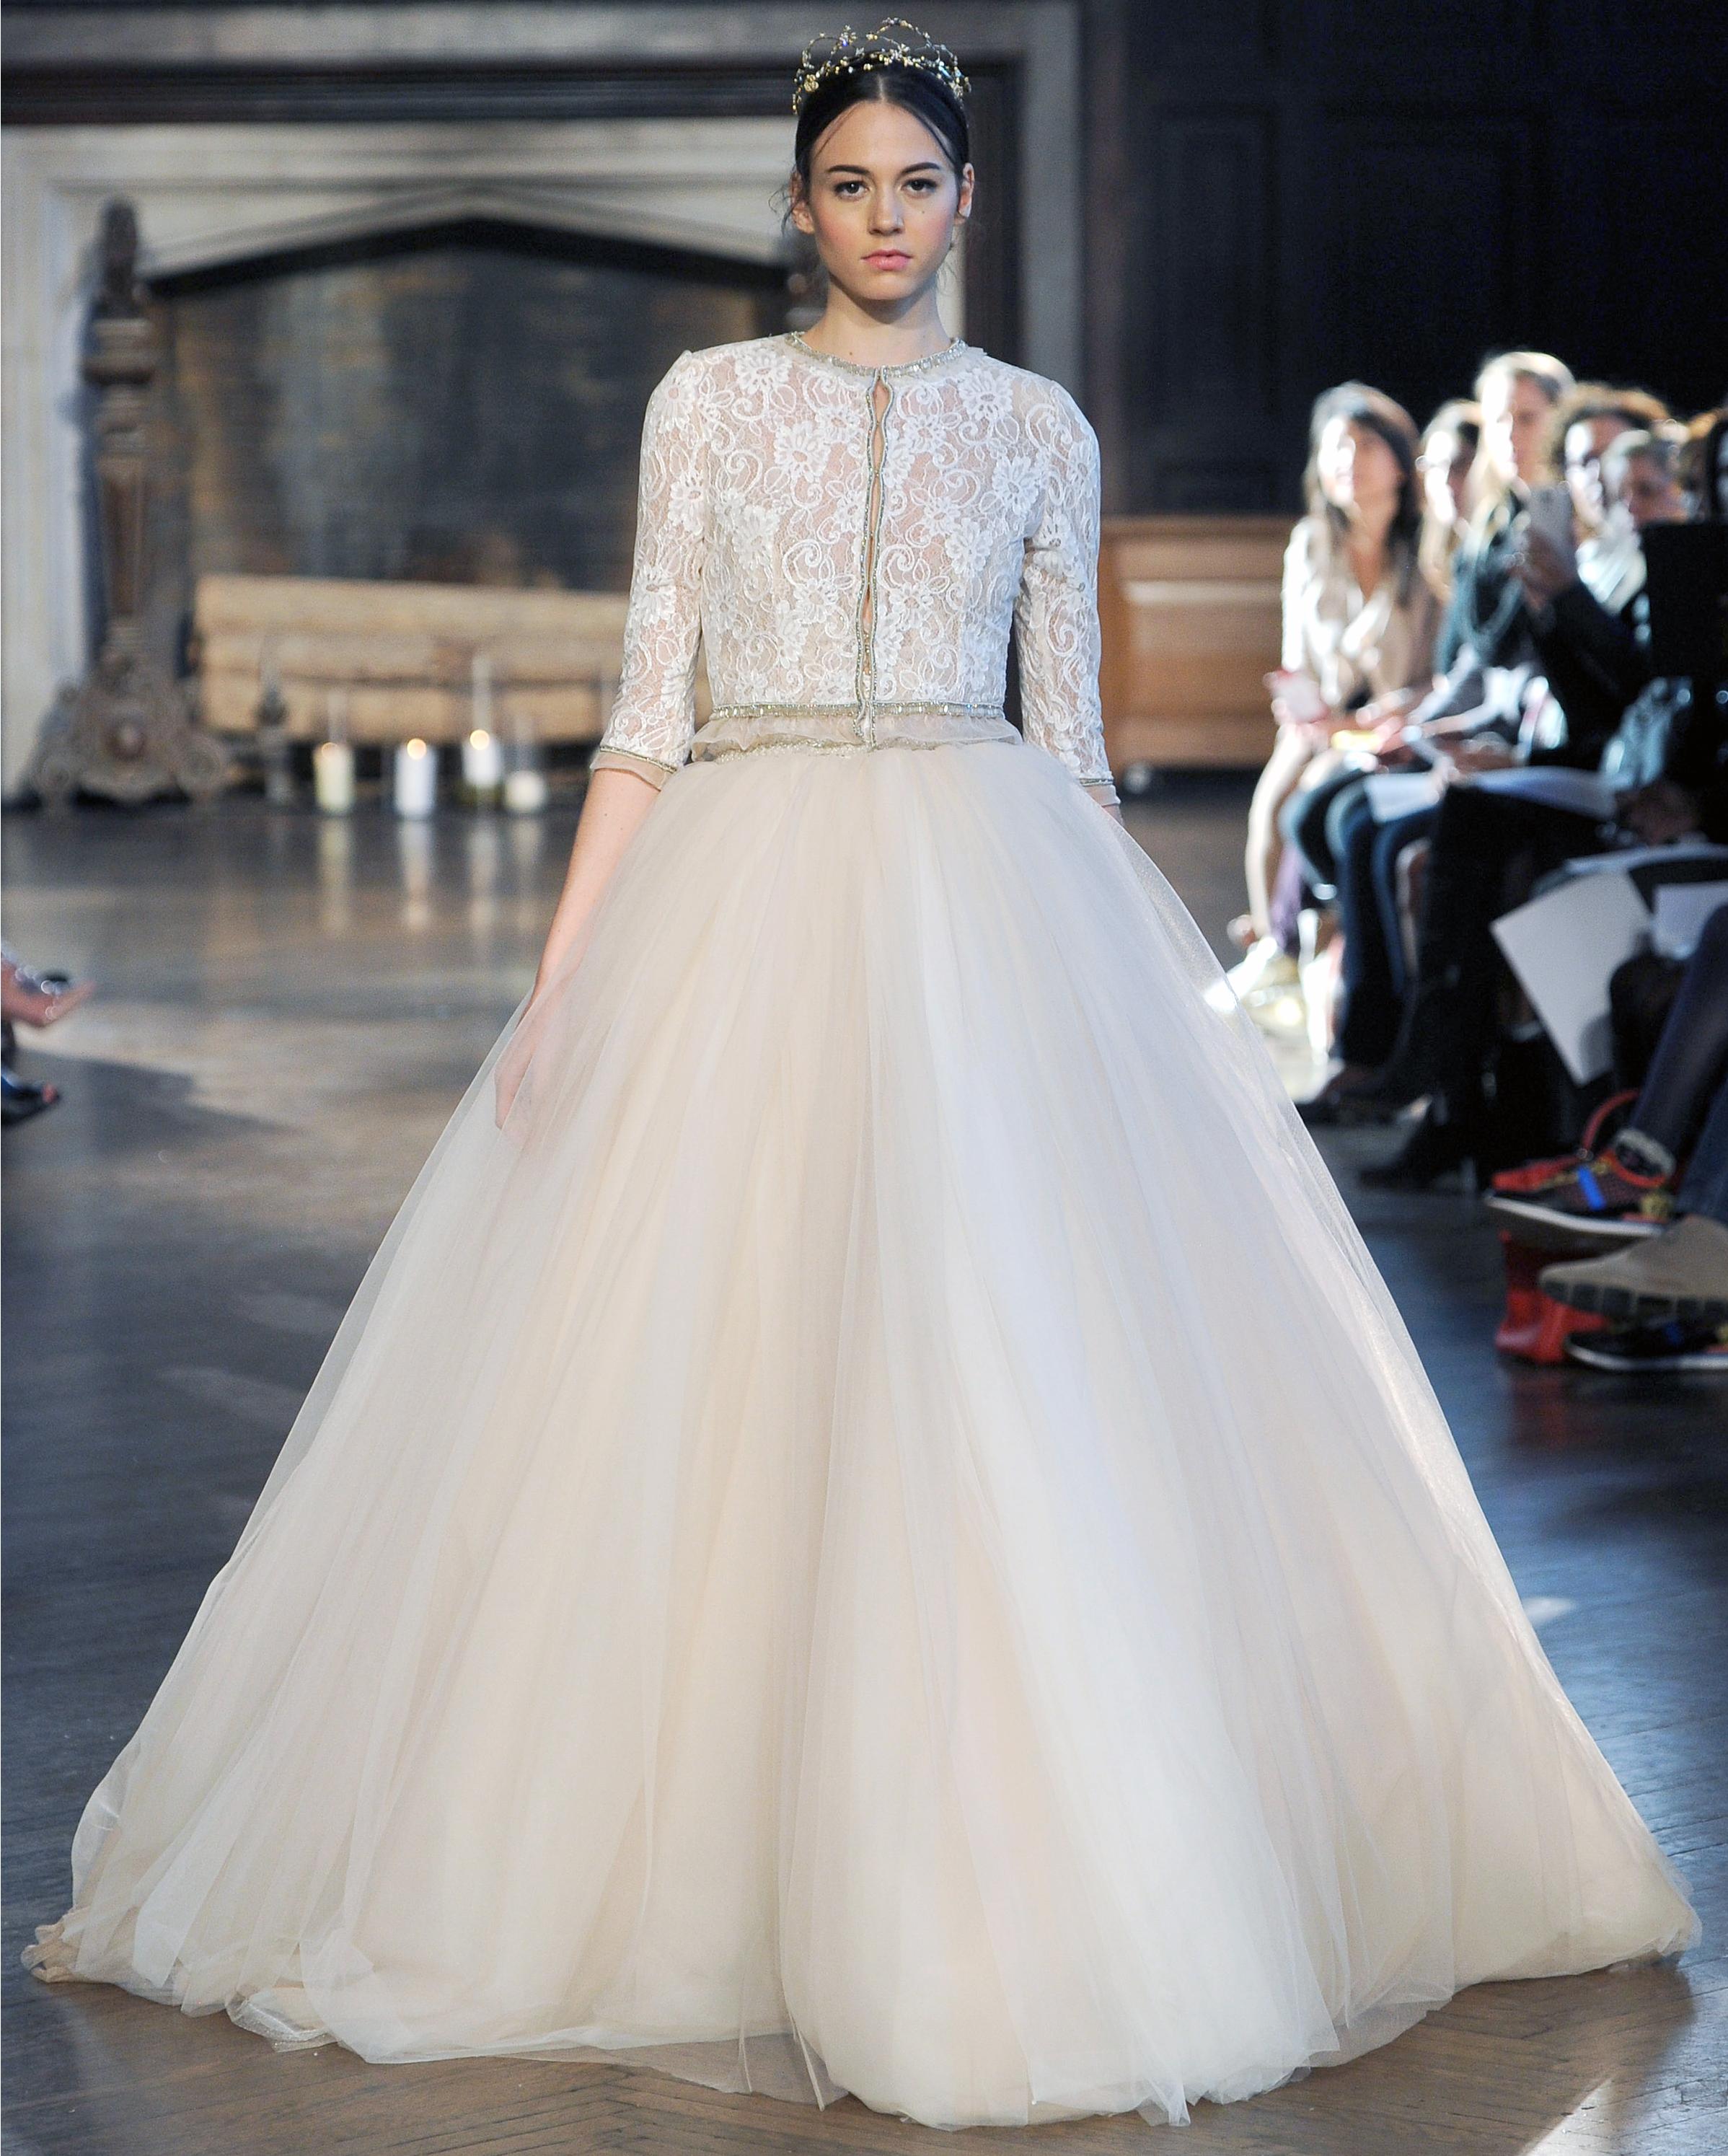 50-states-wedding-dresses-georgia-inbal-dror-0615.jpg